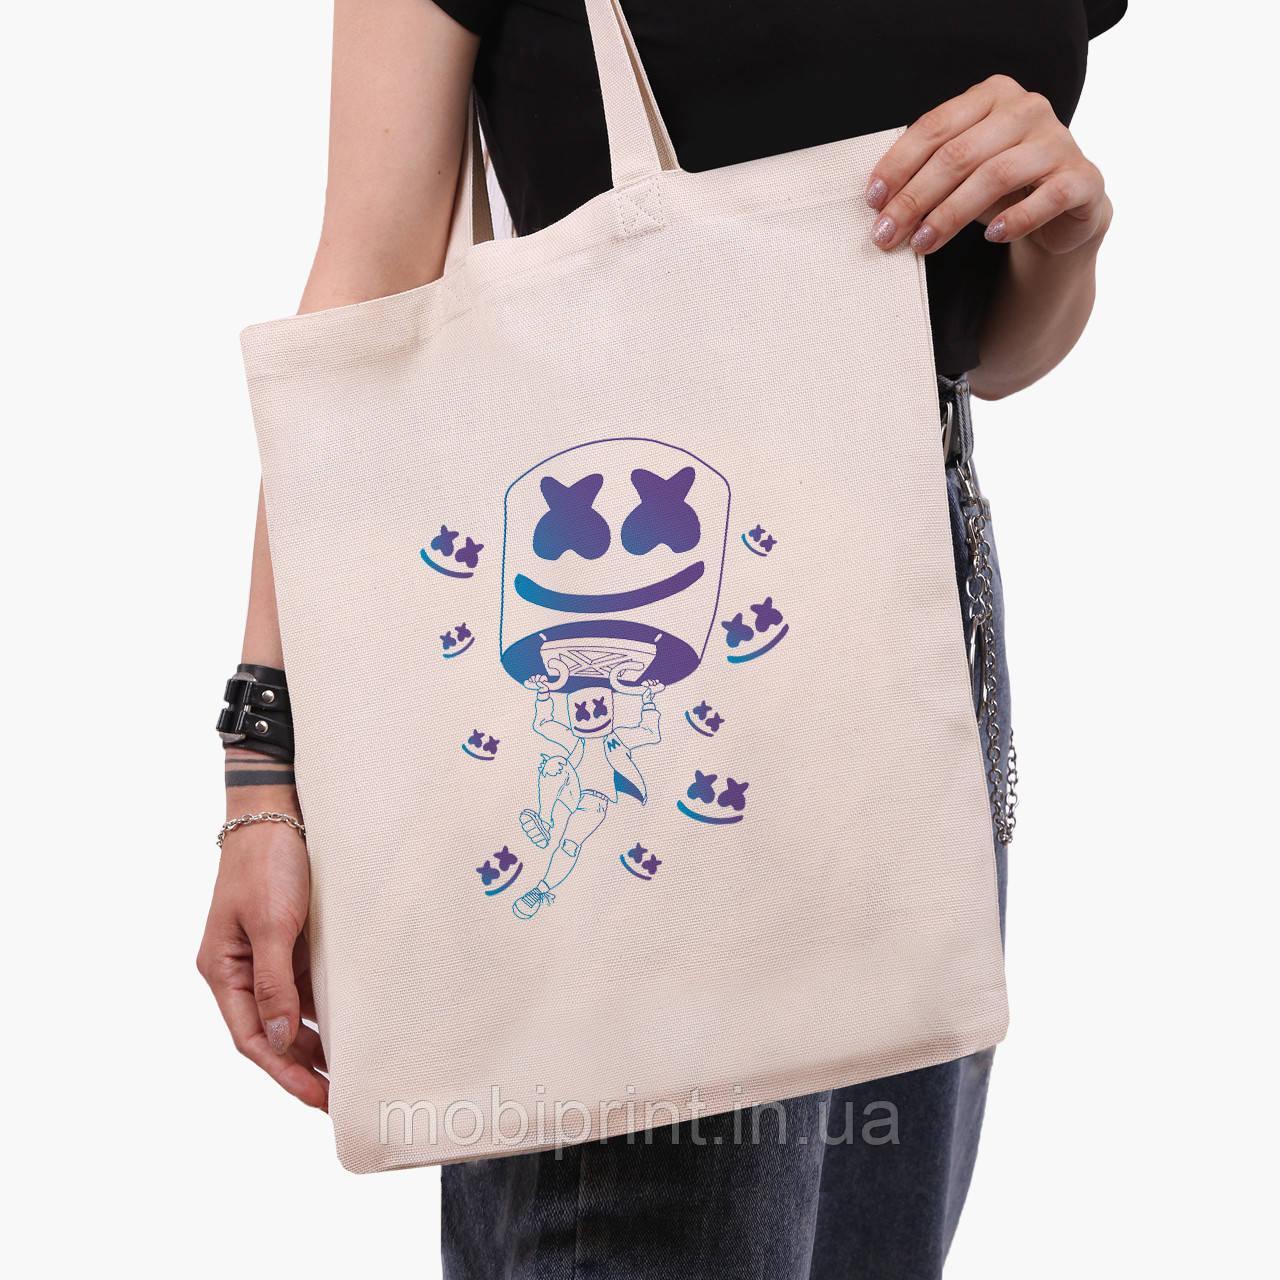 Эко сумка шоппер Маршмелло Фортнайт (Marshmello Fortnite) (9227-1329)  экосумка шопер 41*35 см